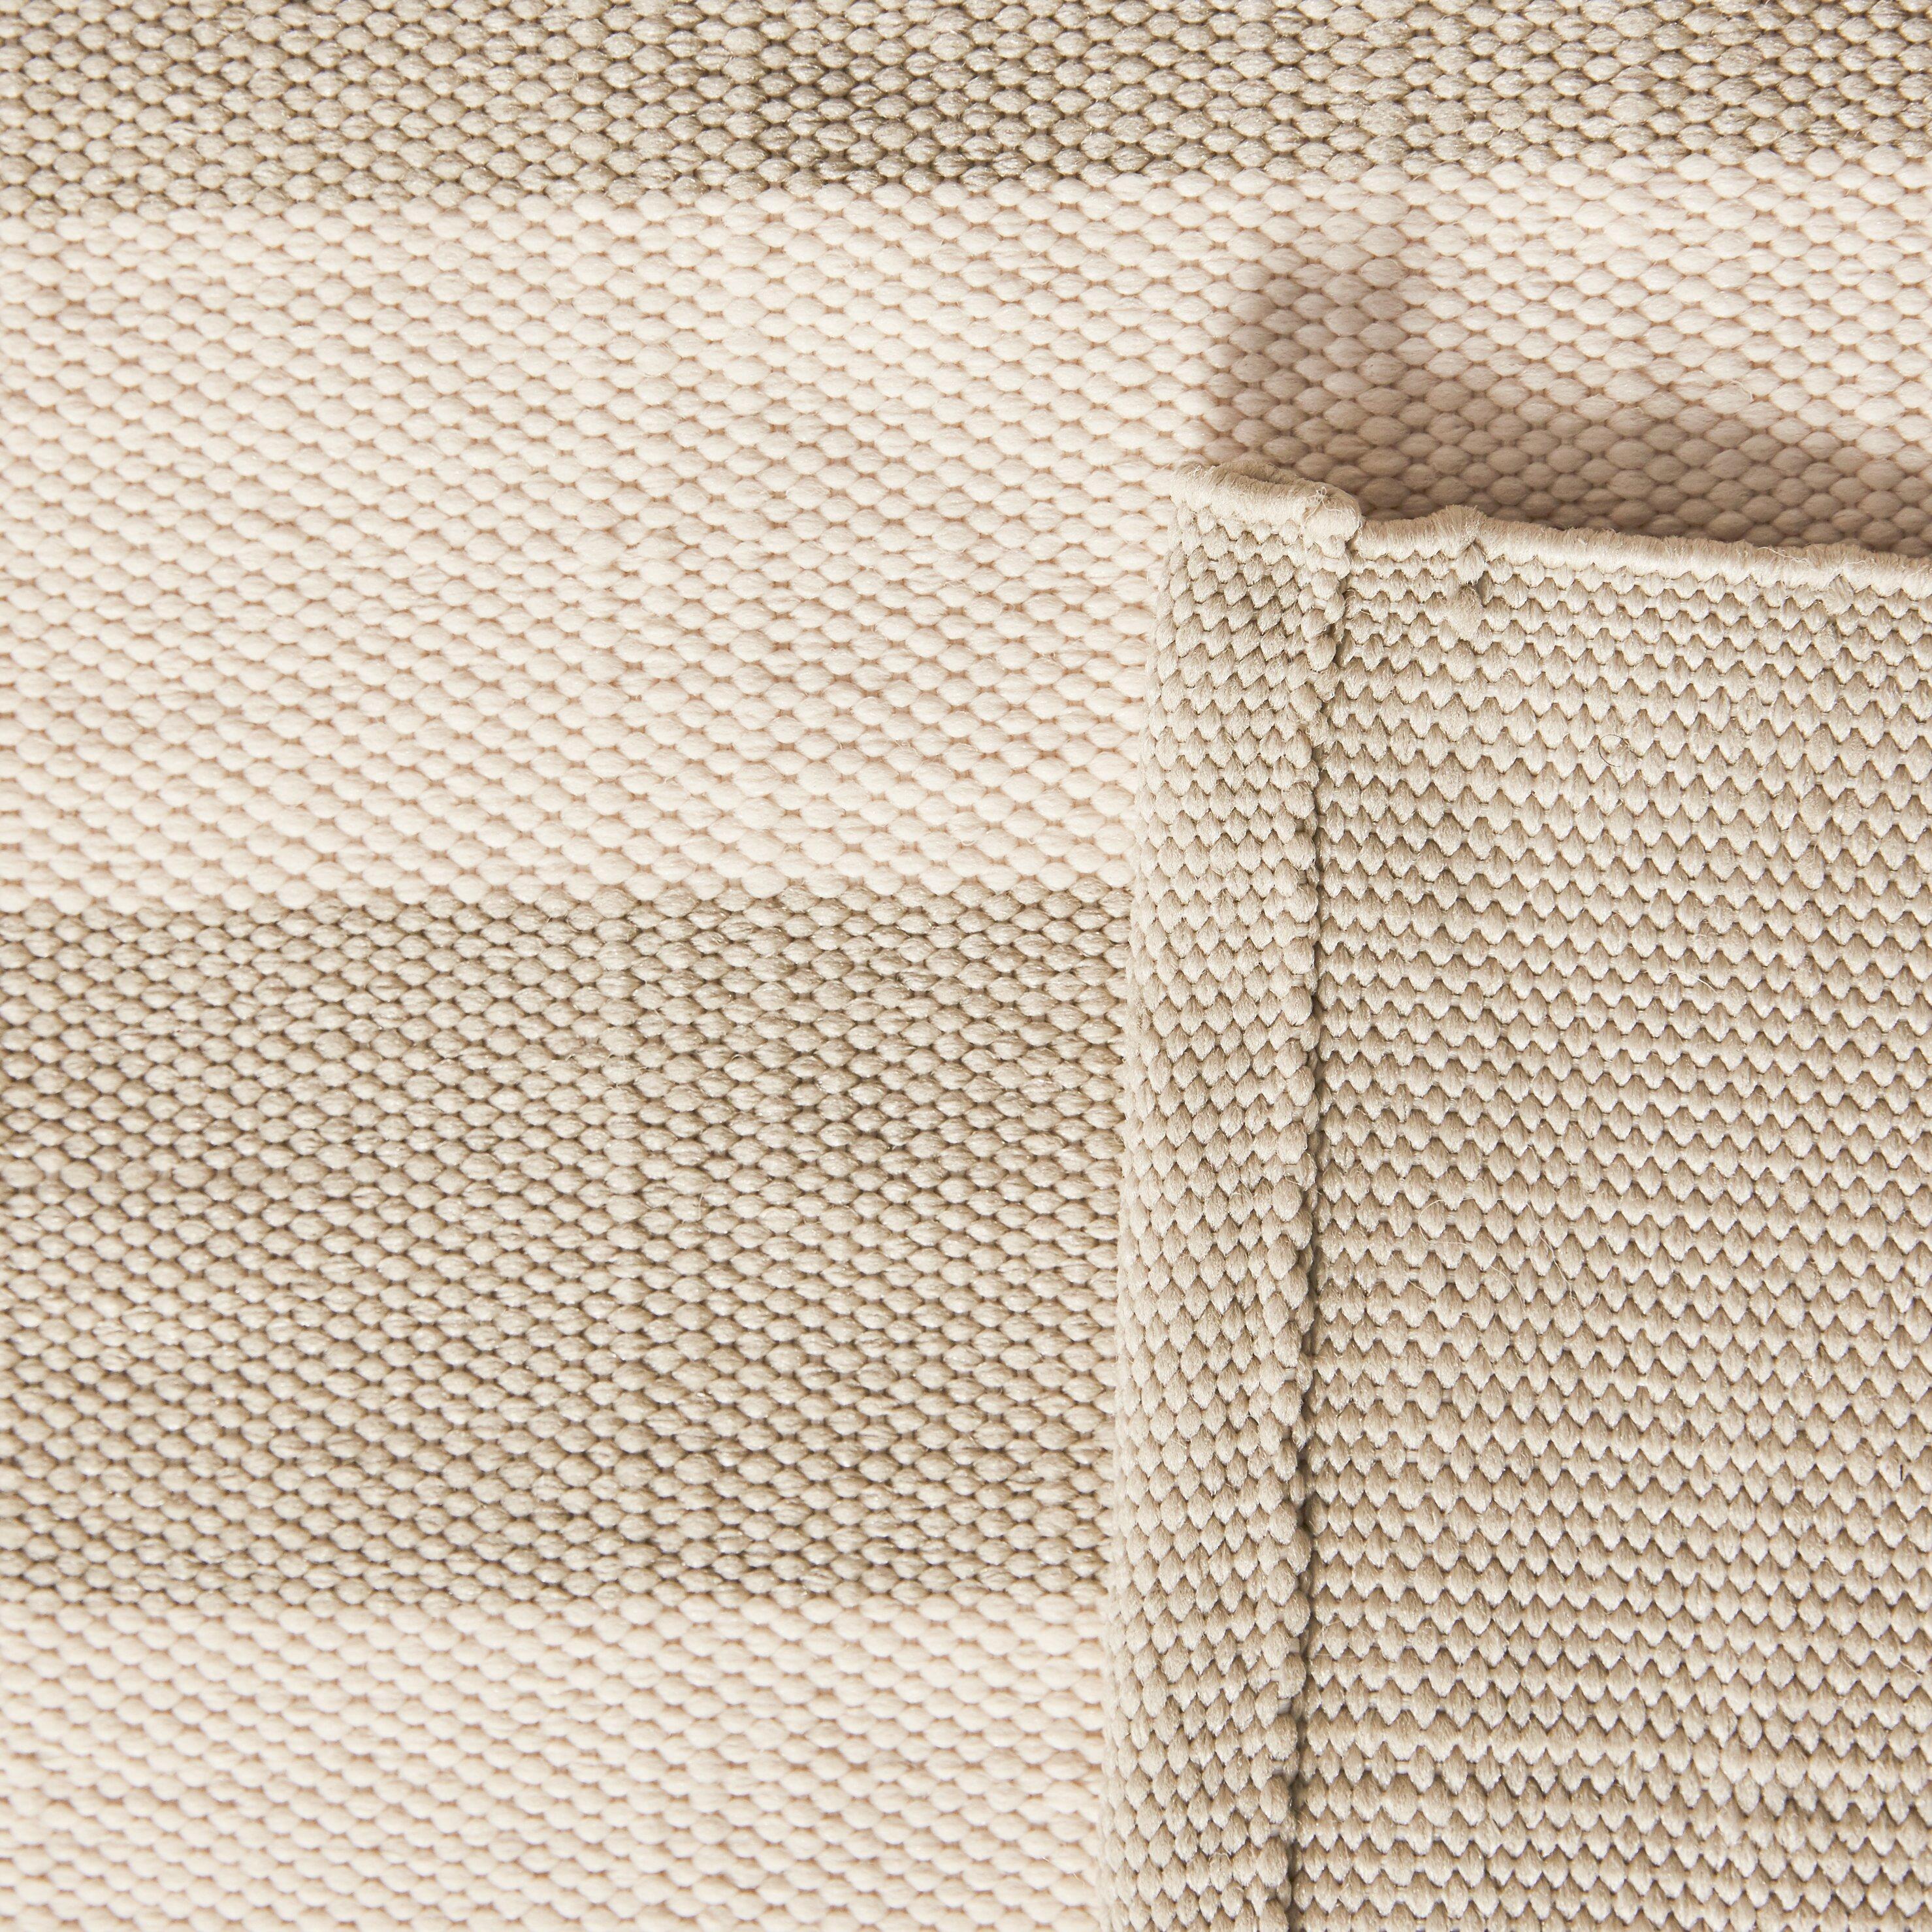 Dash and albert rugs catamaran hand woven platinum ivory for Dash and albert blankets